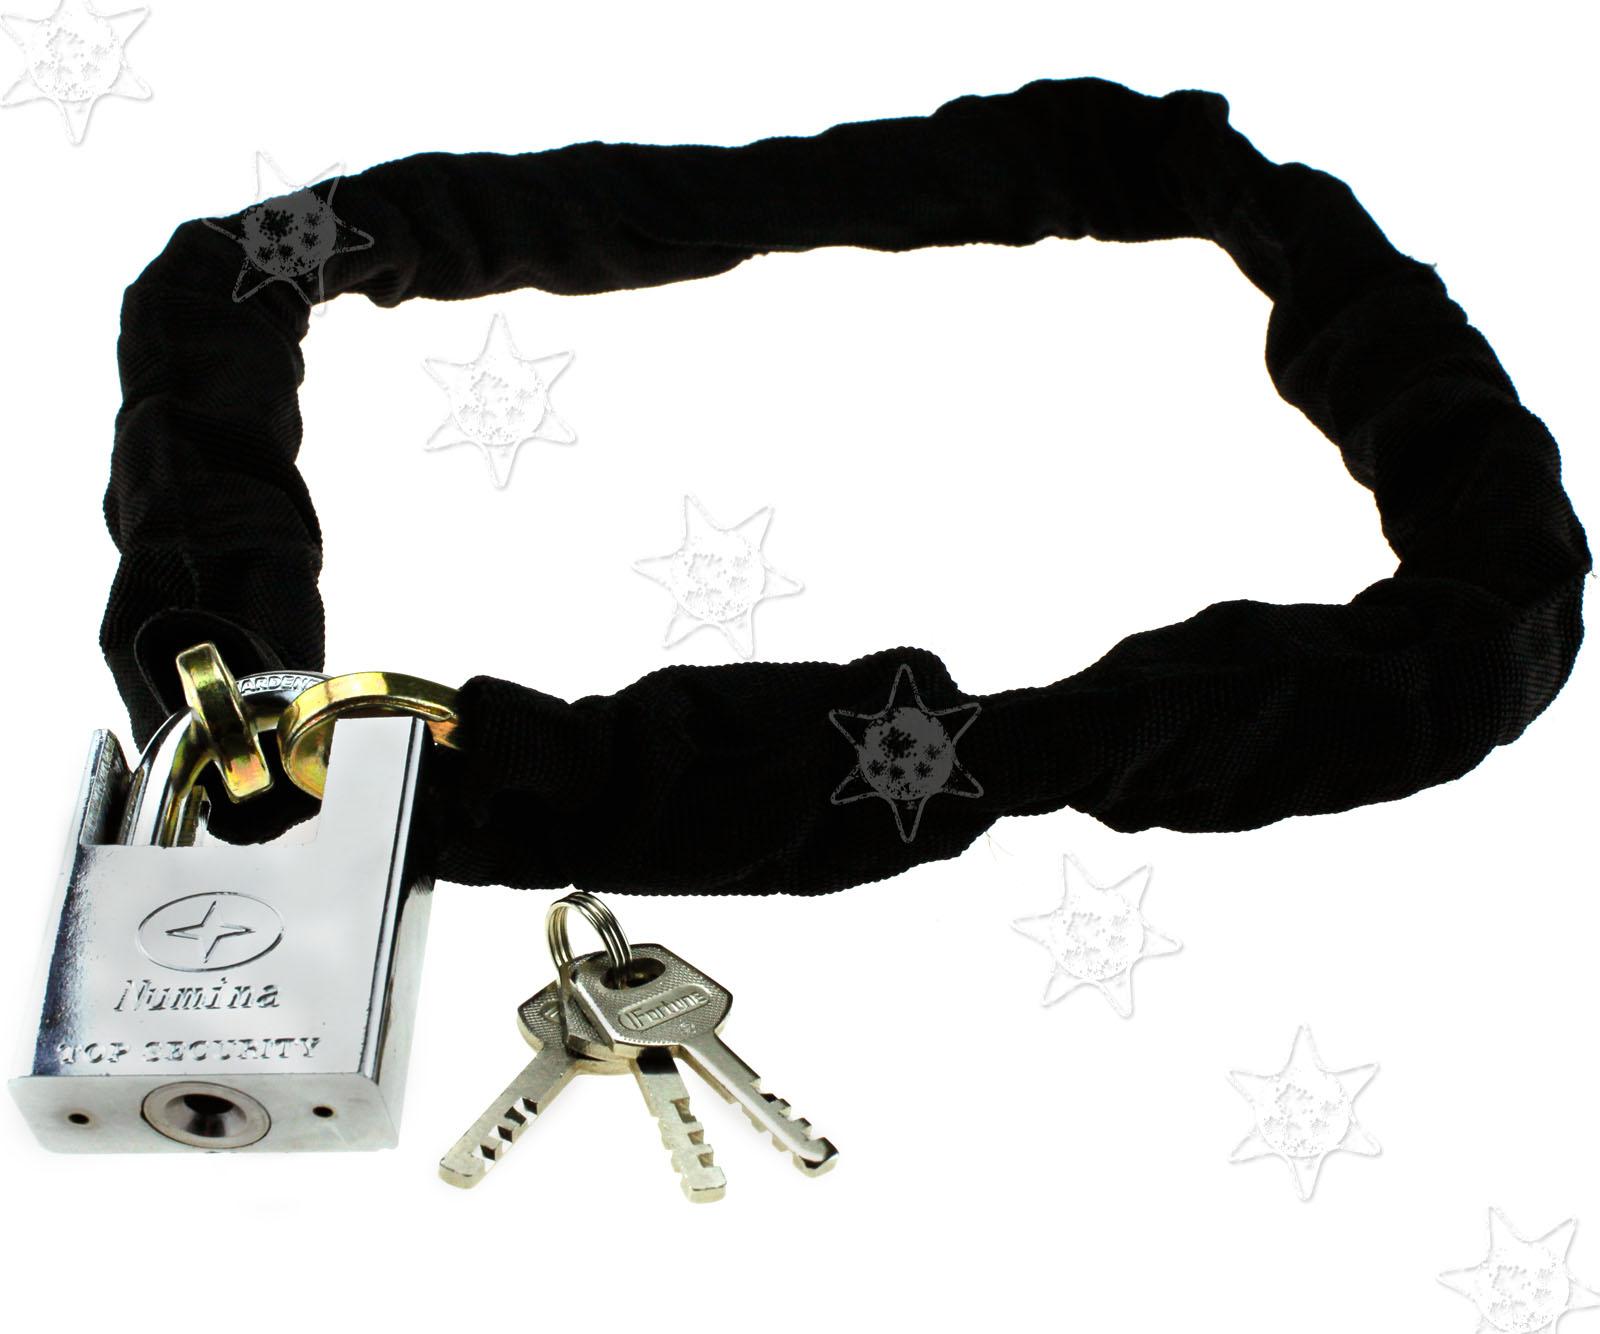 High Security Motorcycle Bike Bicycle Chain Padlock Lock Nylon Steel 7.5mm-100cm